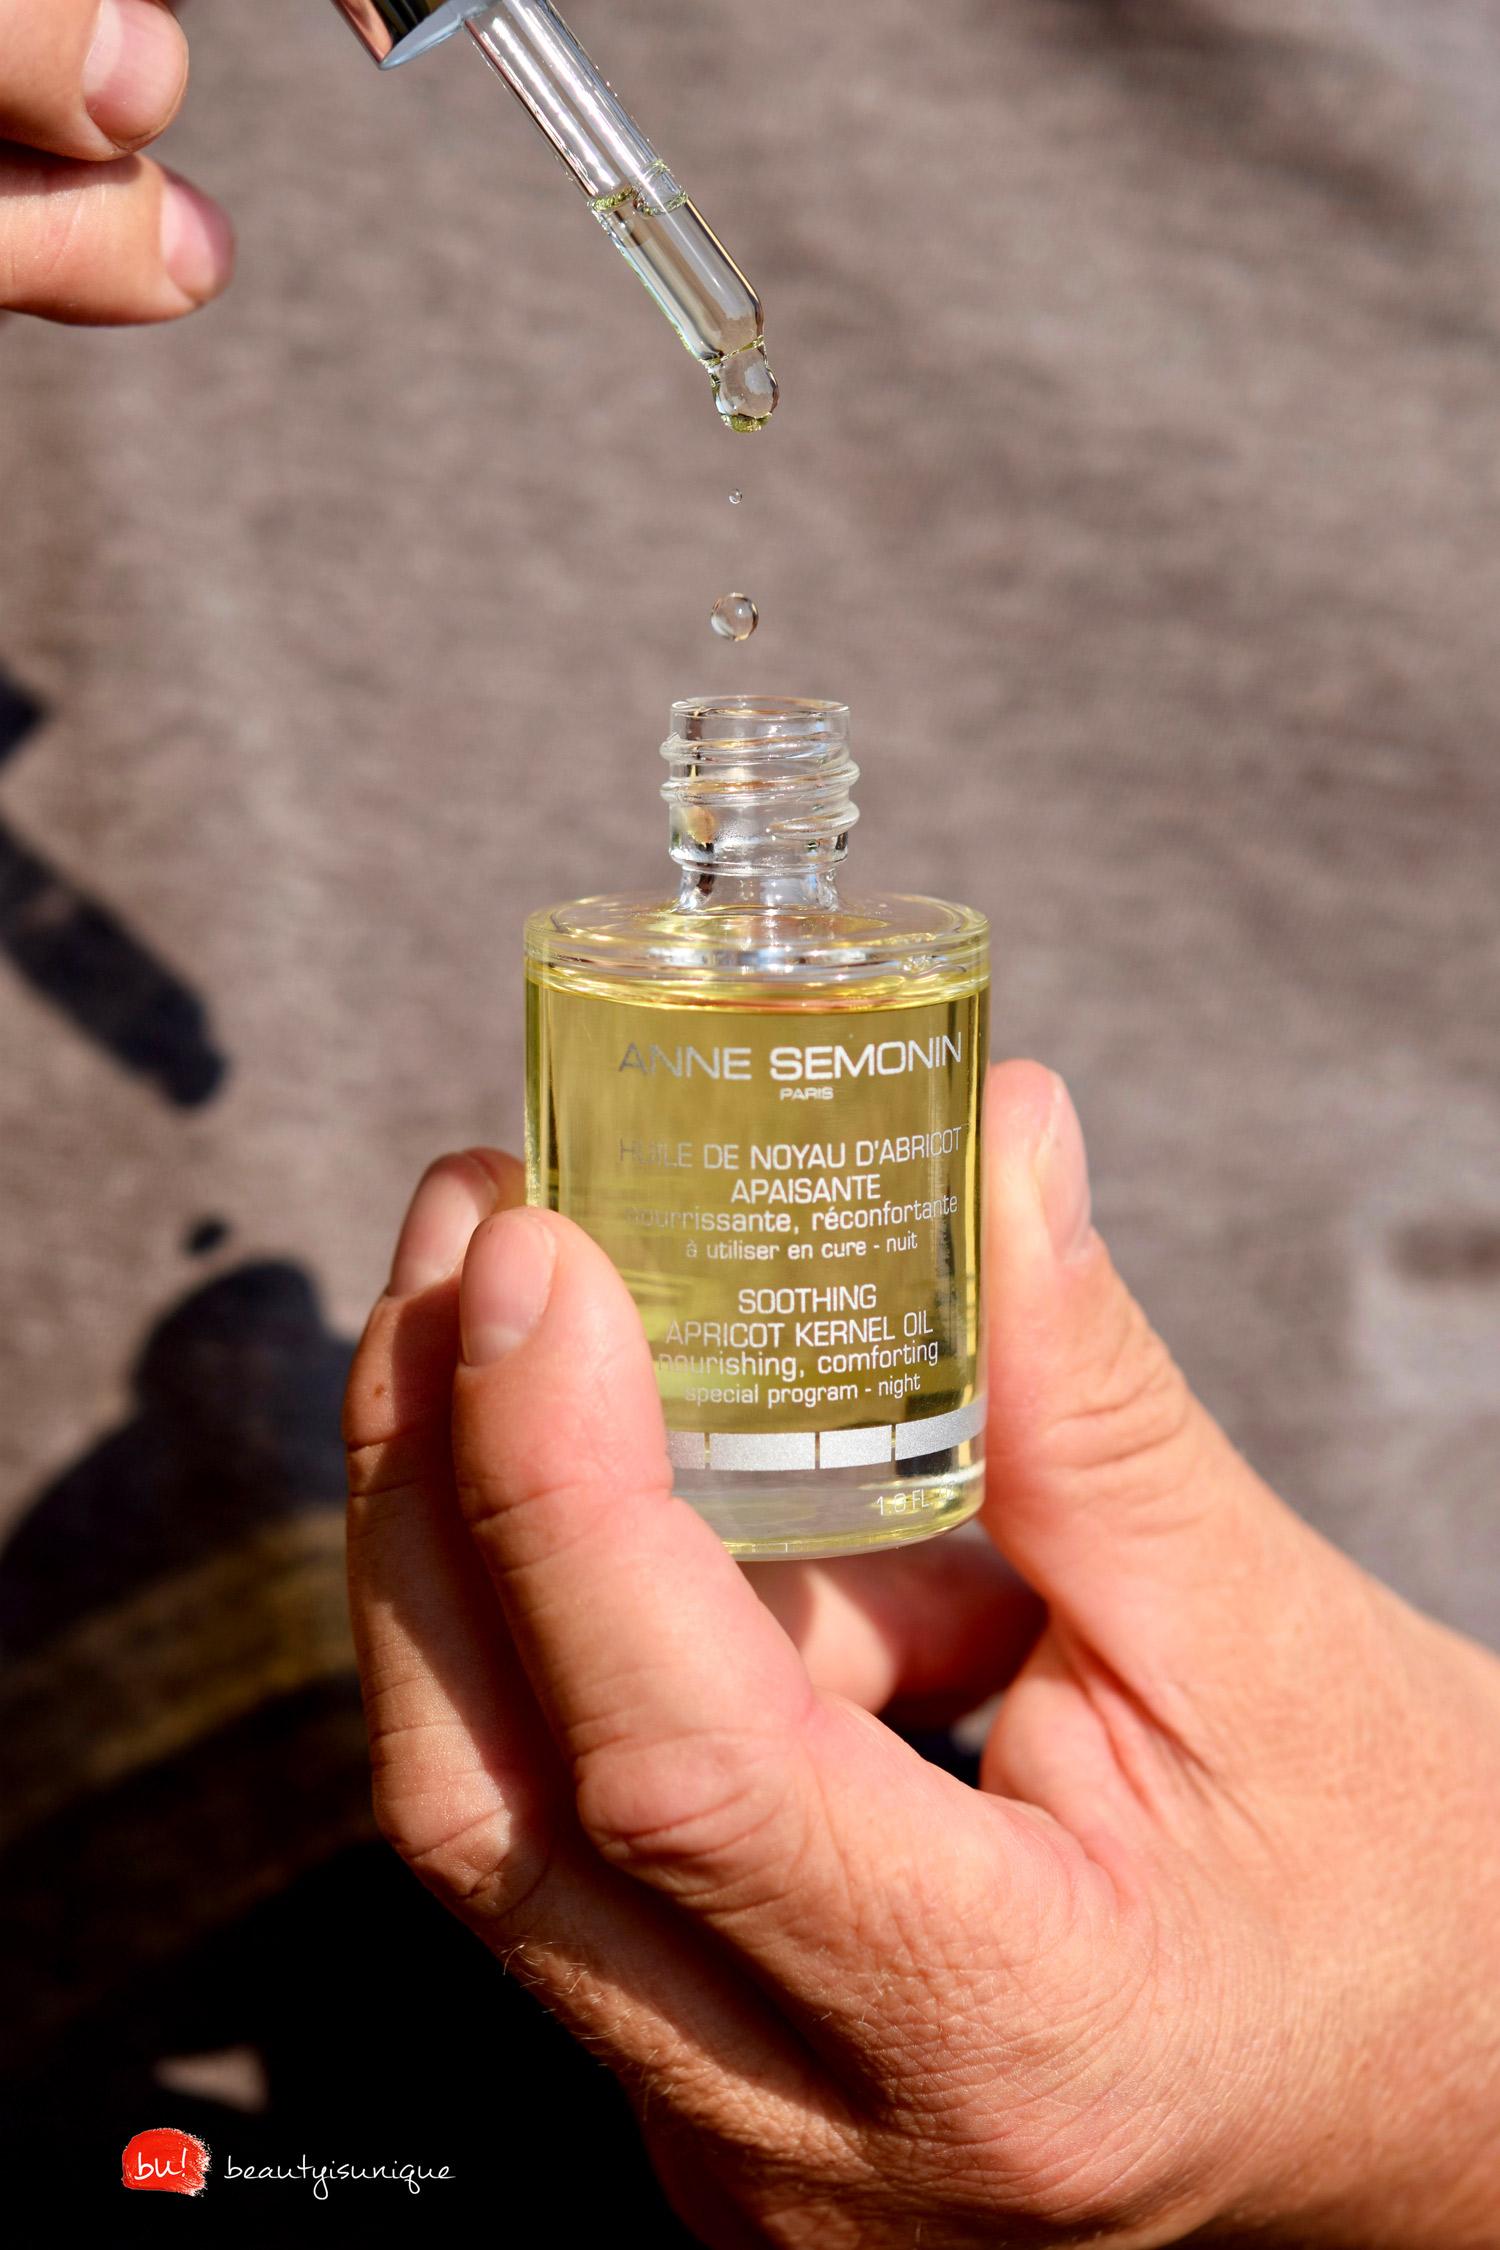 Anne-semonin-soothing-apricot-kernel-oil